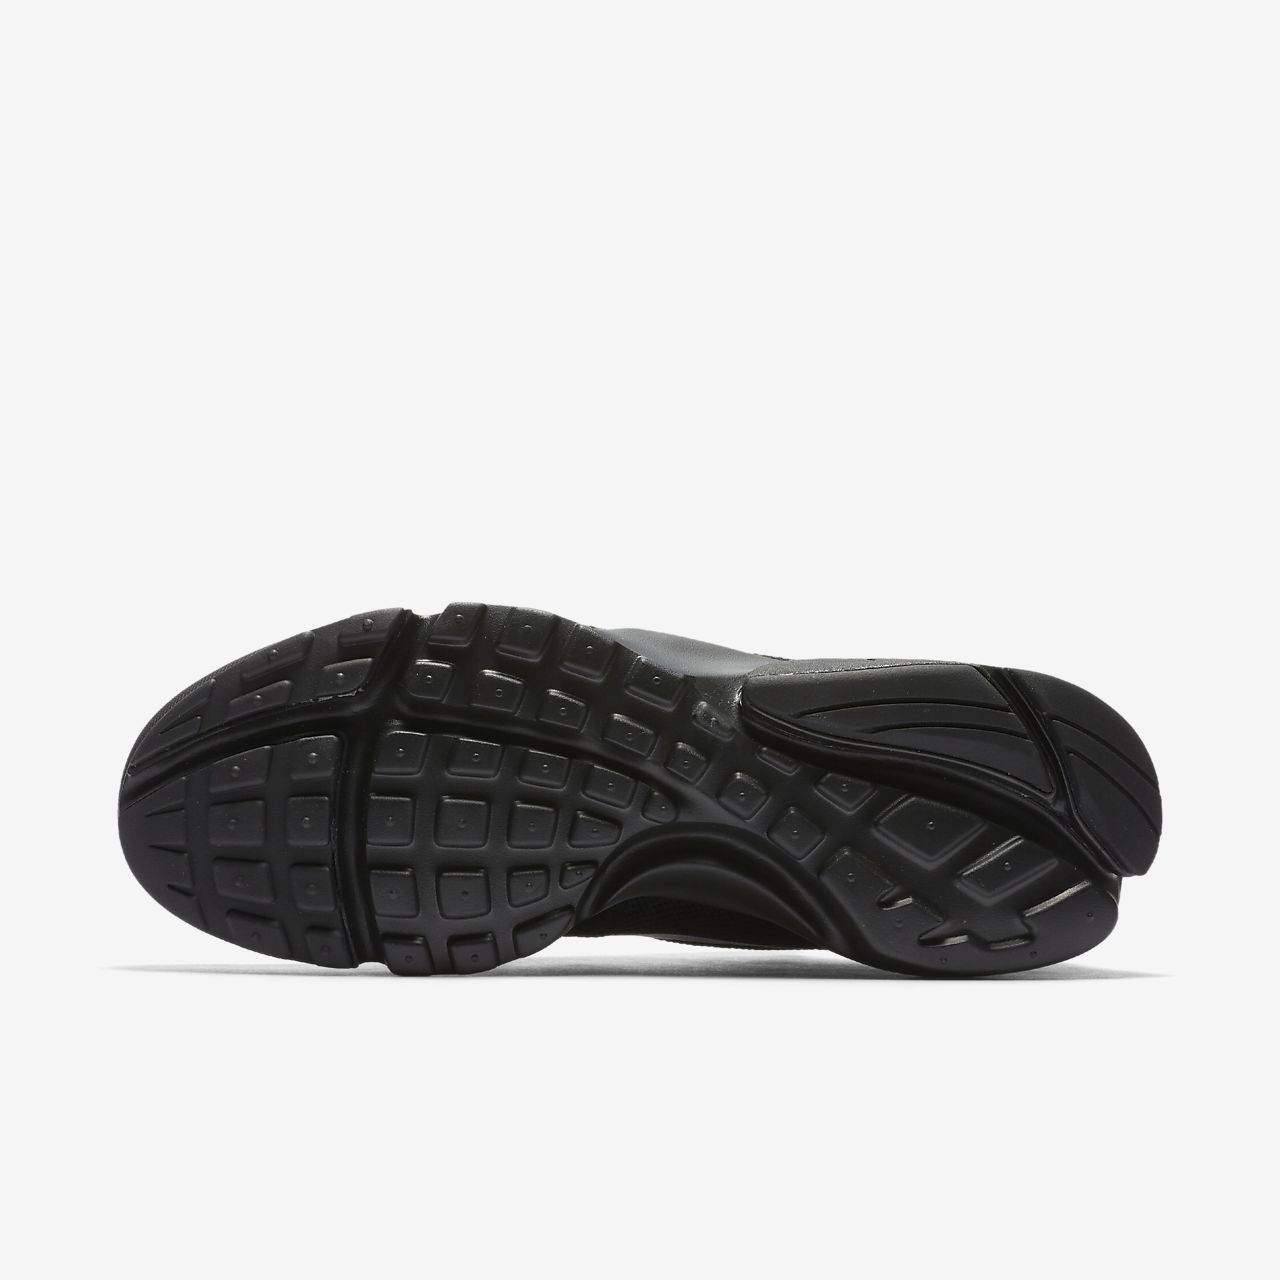 new concept d3b6b 5a13c ... Nike Presto Fly Men s Shoe